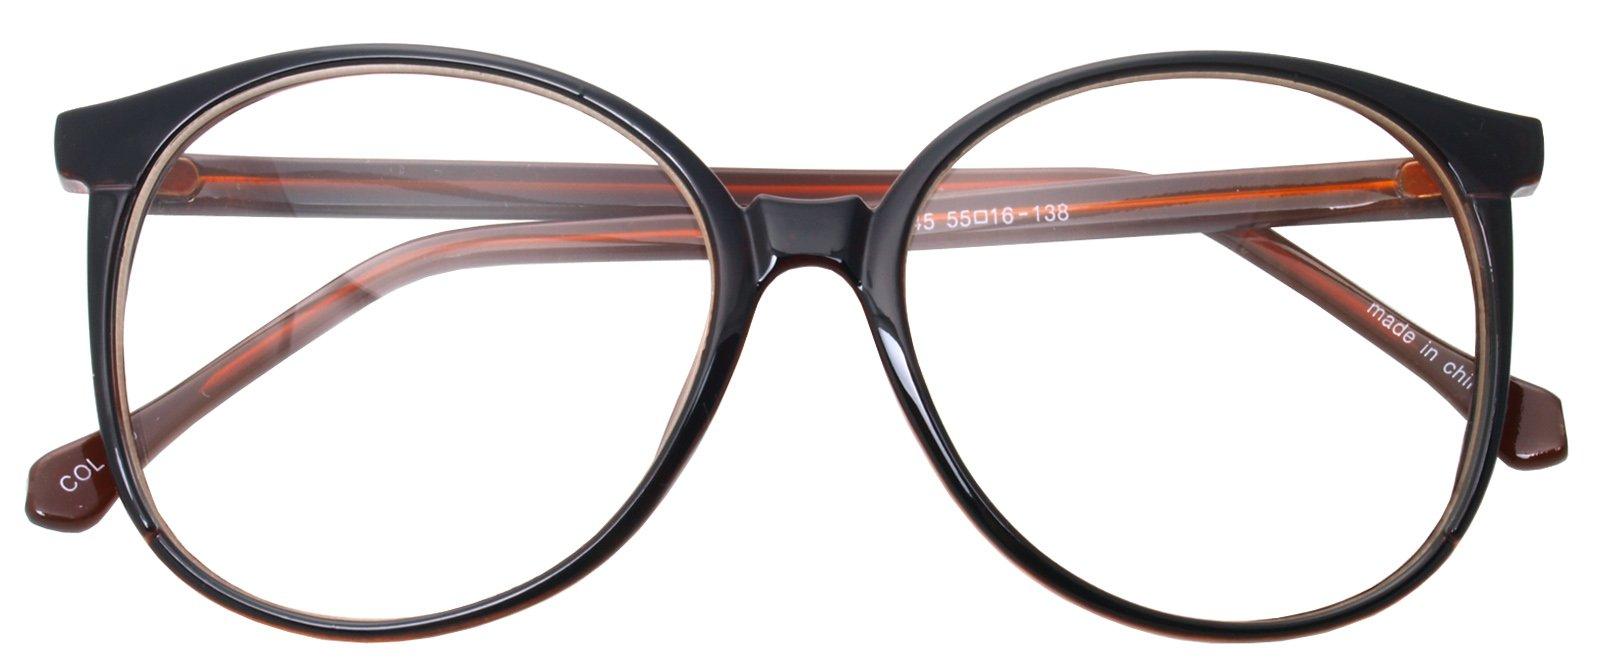 dcf6da5fcf7 Galleon - Oversized Big Round Horn Rimmed Eye Glasses Clear Lens Oval Frame  Non Prescription (BROWN 6045)